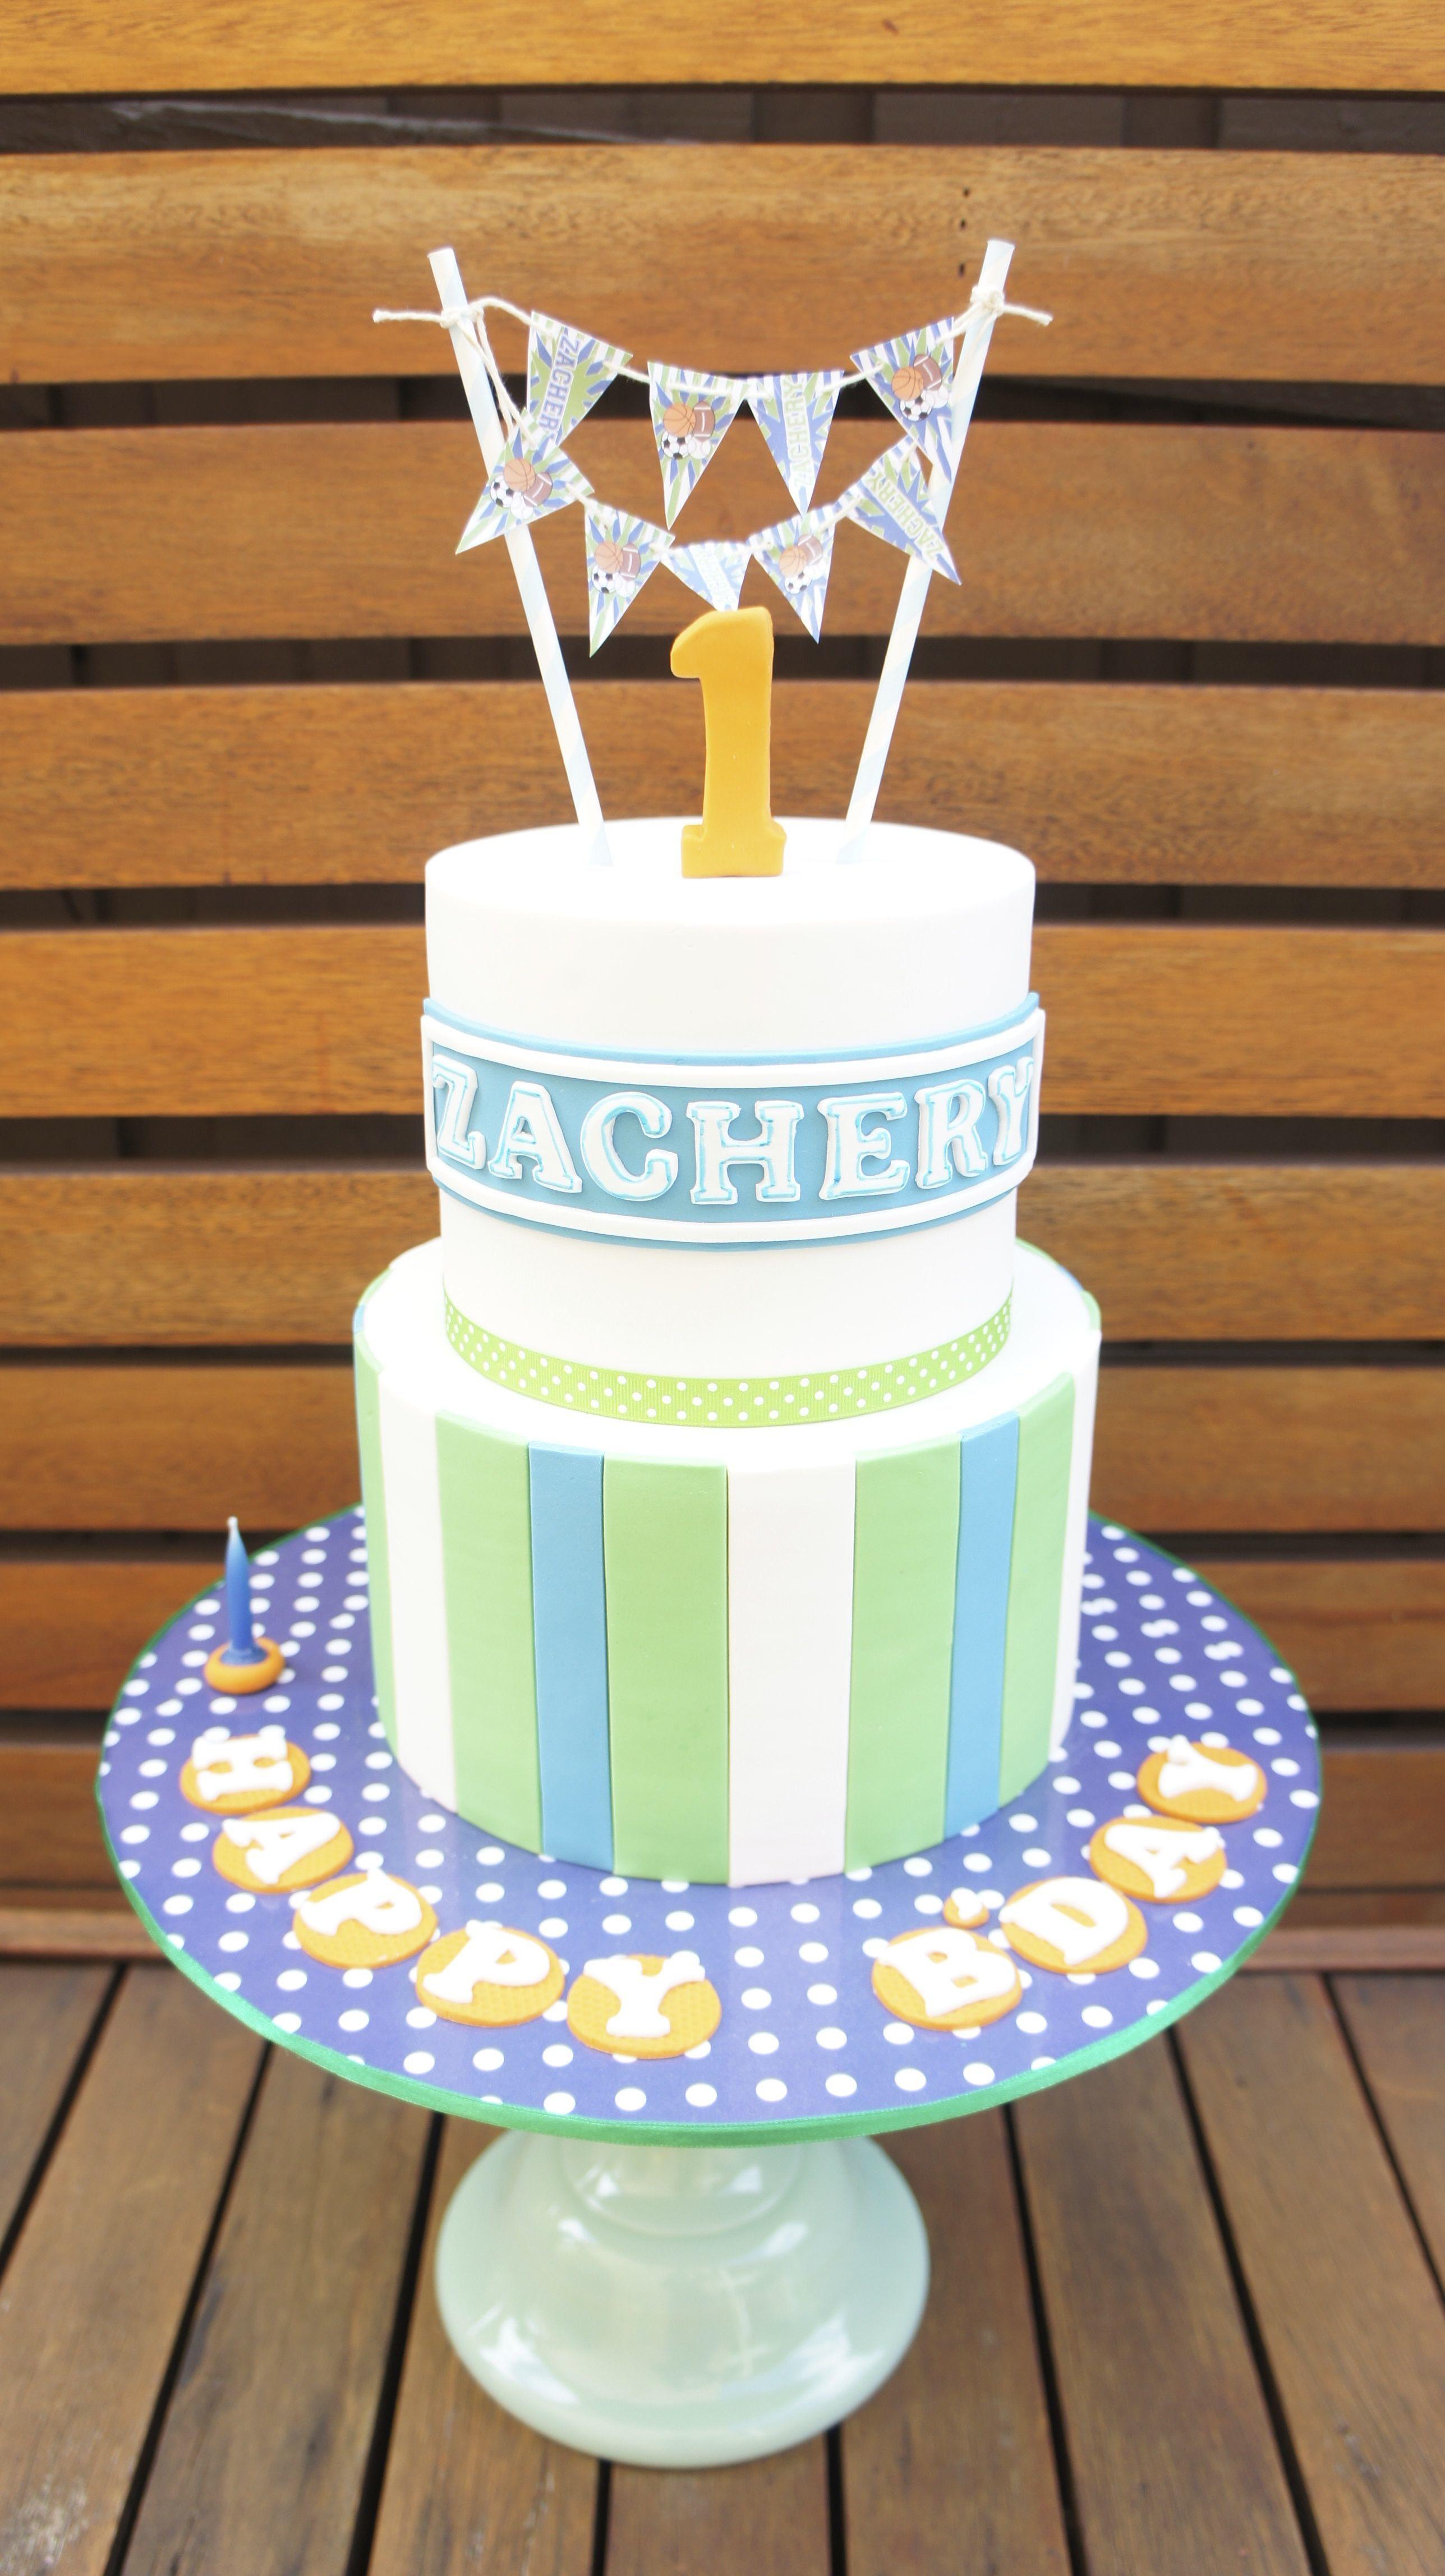 cakes2cupcakes-bunting-stripes.jpg